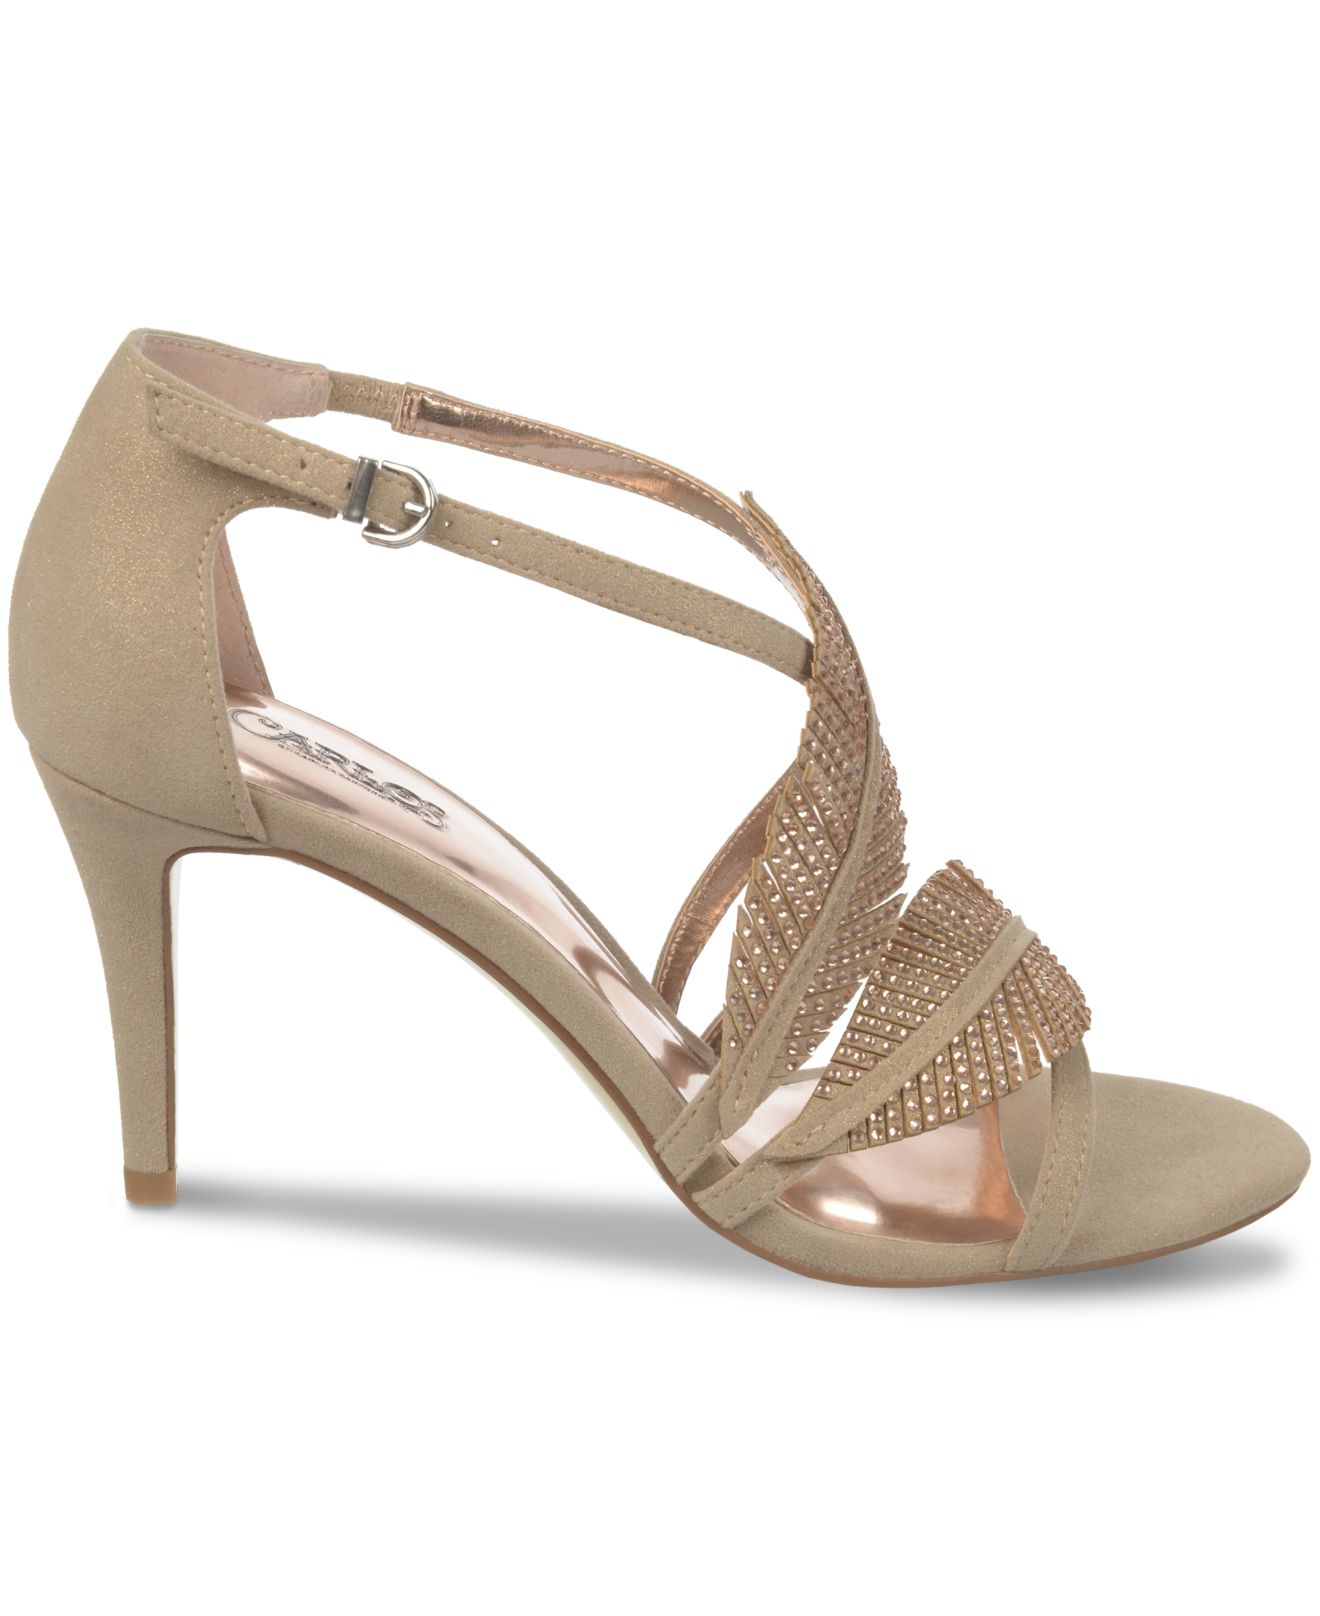 51ae92c7e19 Lyst - Carlos By Carlos Santana Frisco Dress Sandals in Natural